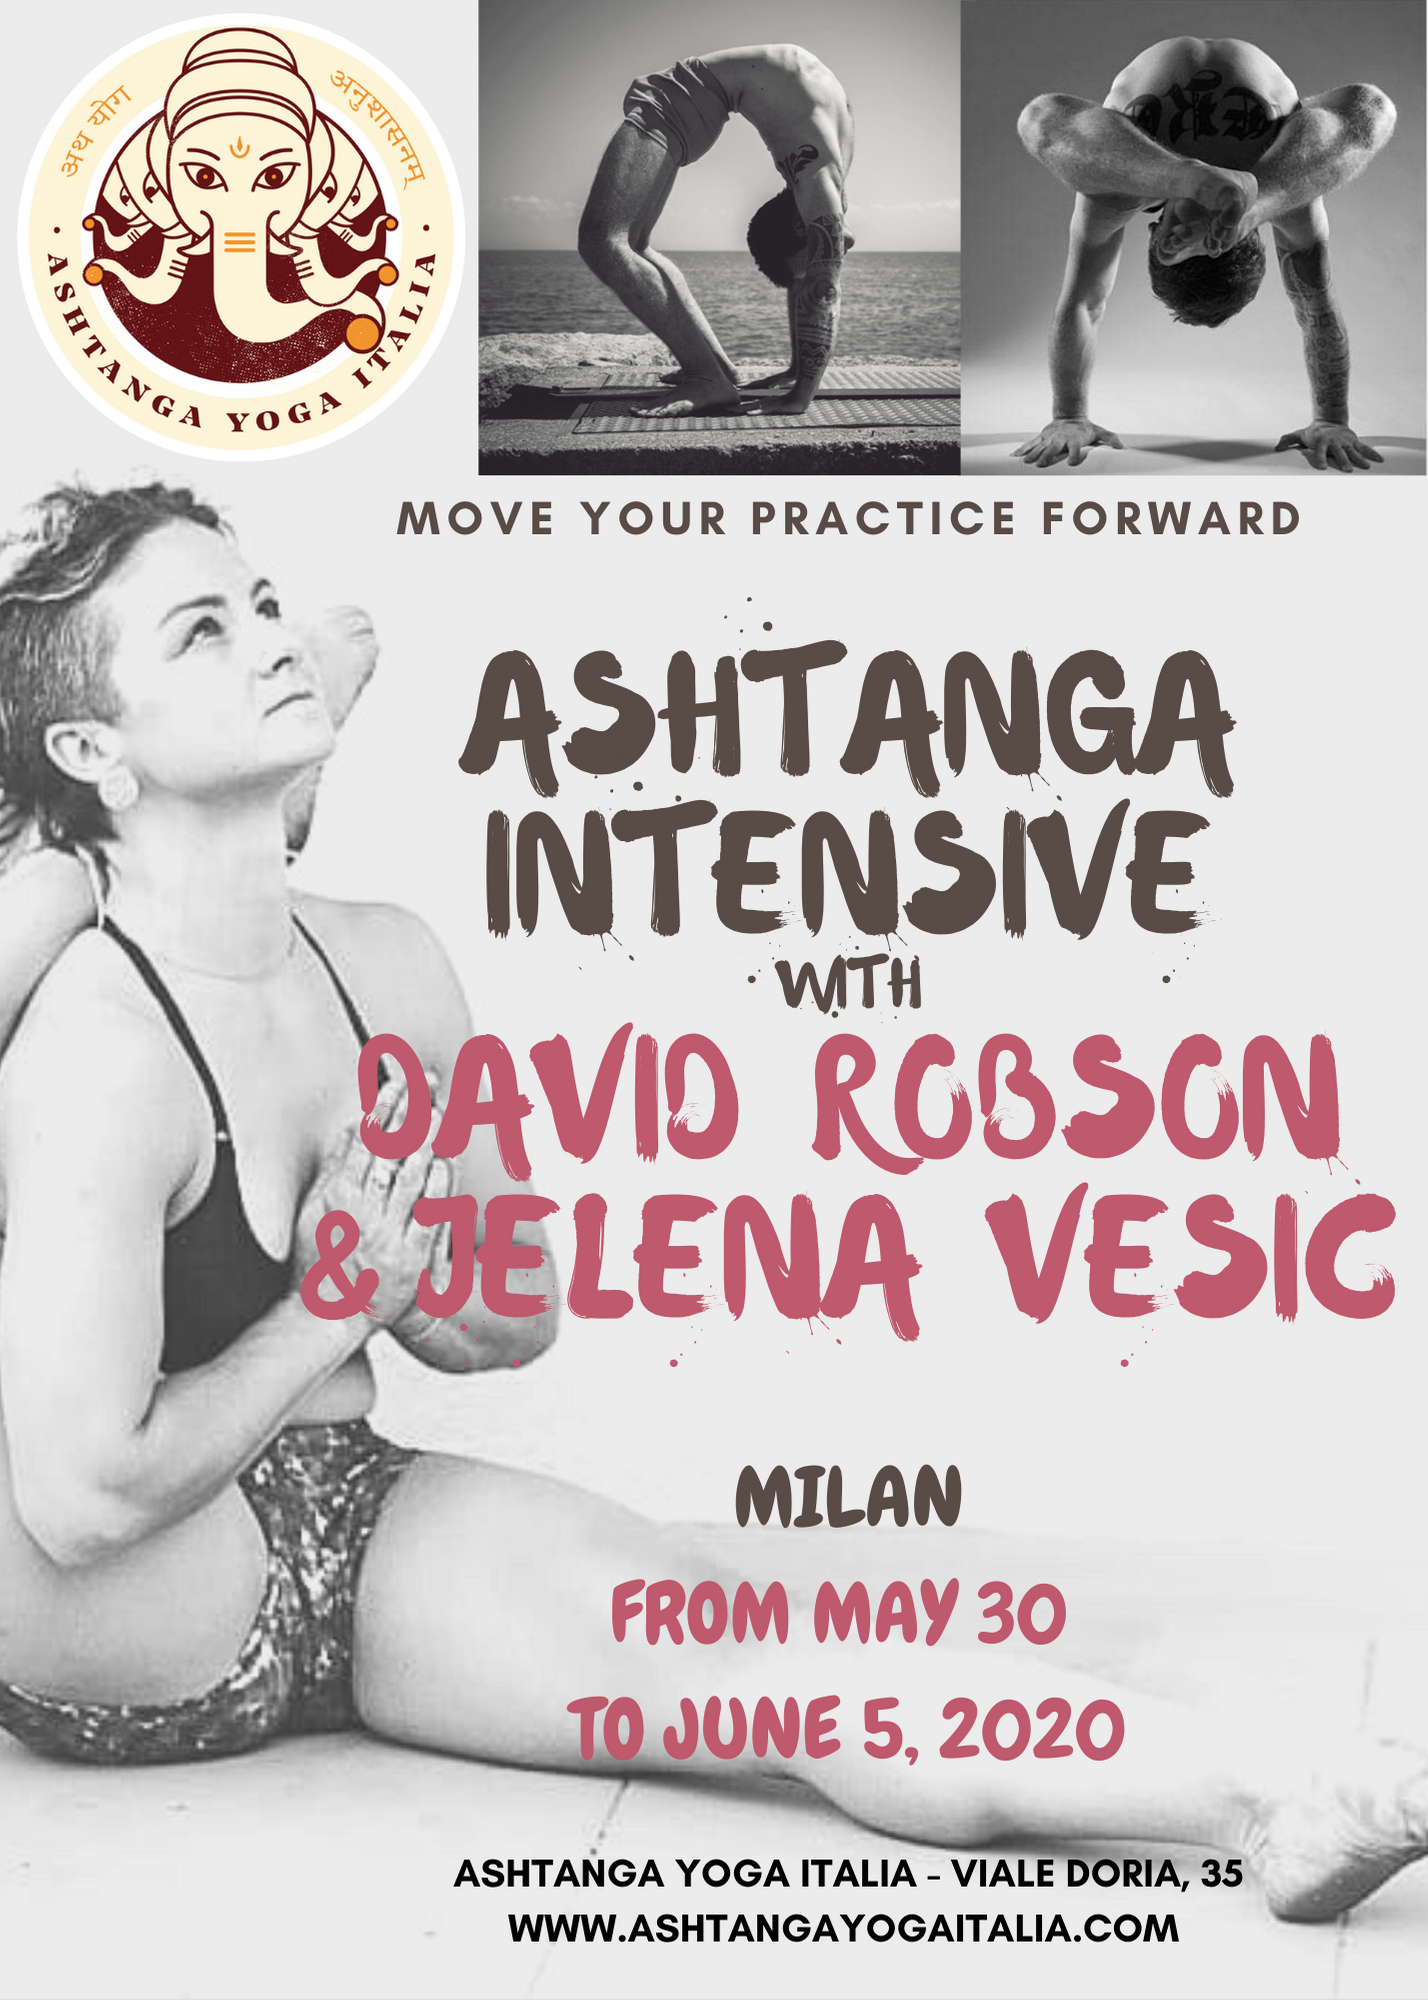 david-robson-jelena-vesic-ashtanga-yoga-italia-milano-ENGLISH